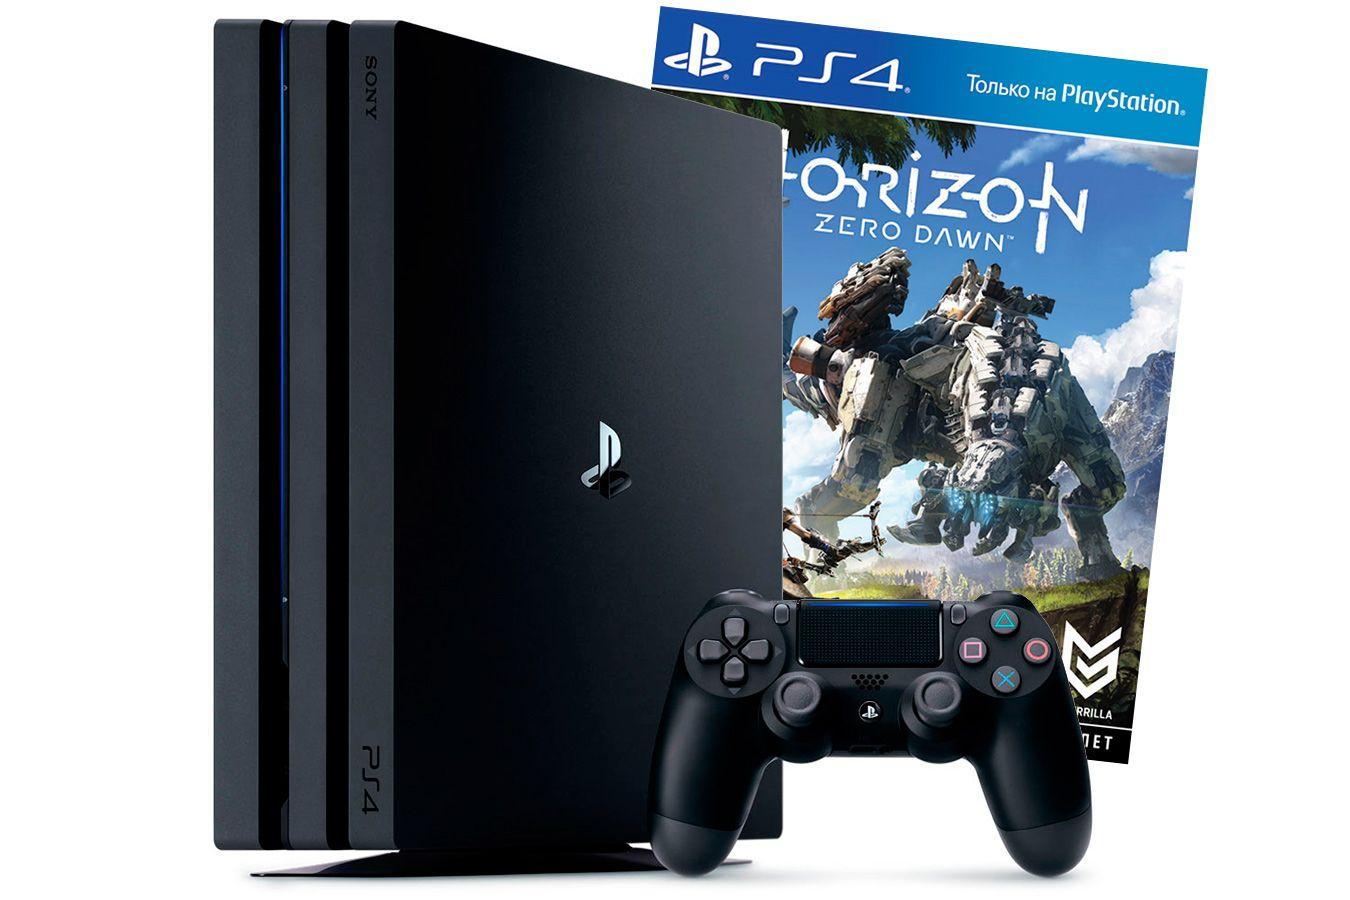 PlayStation 4 Pro 1Tb игровая приставка с игрой Horizon Zero Dawn [PS4P1HZ]